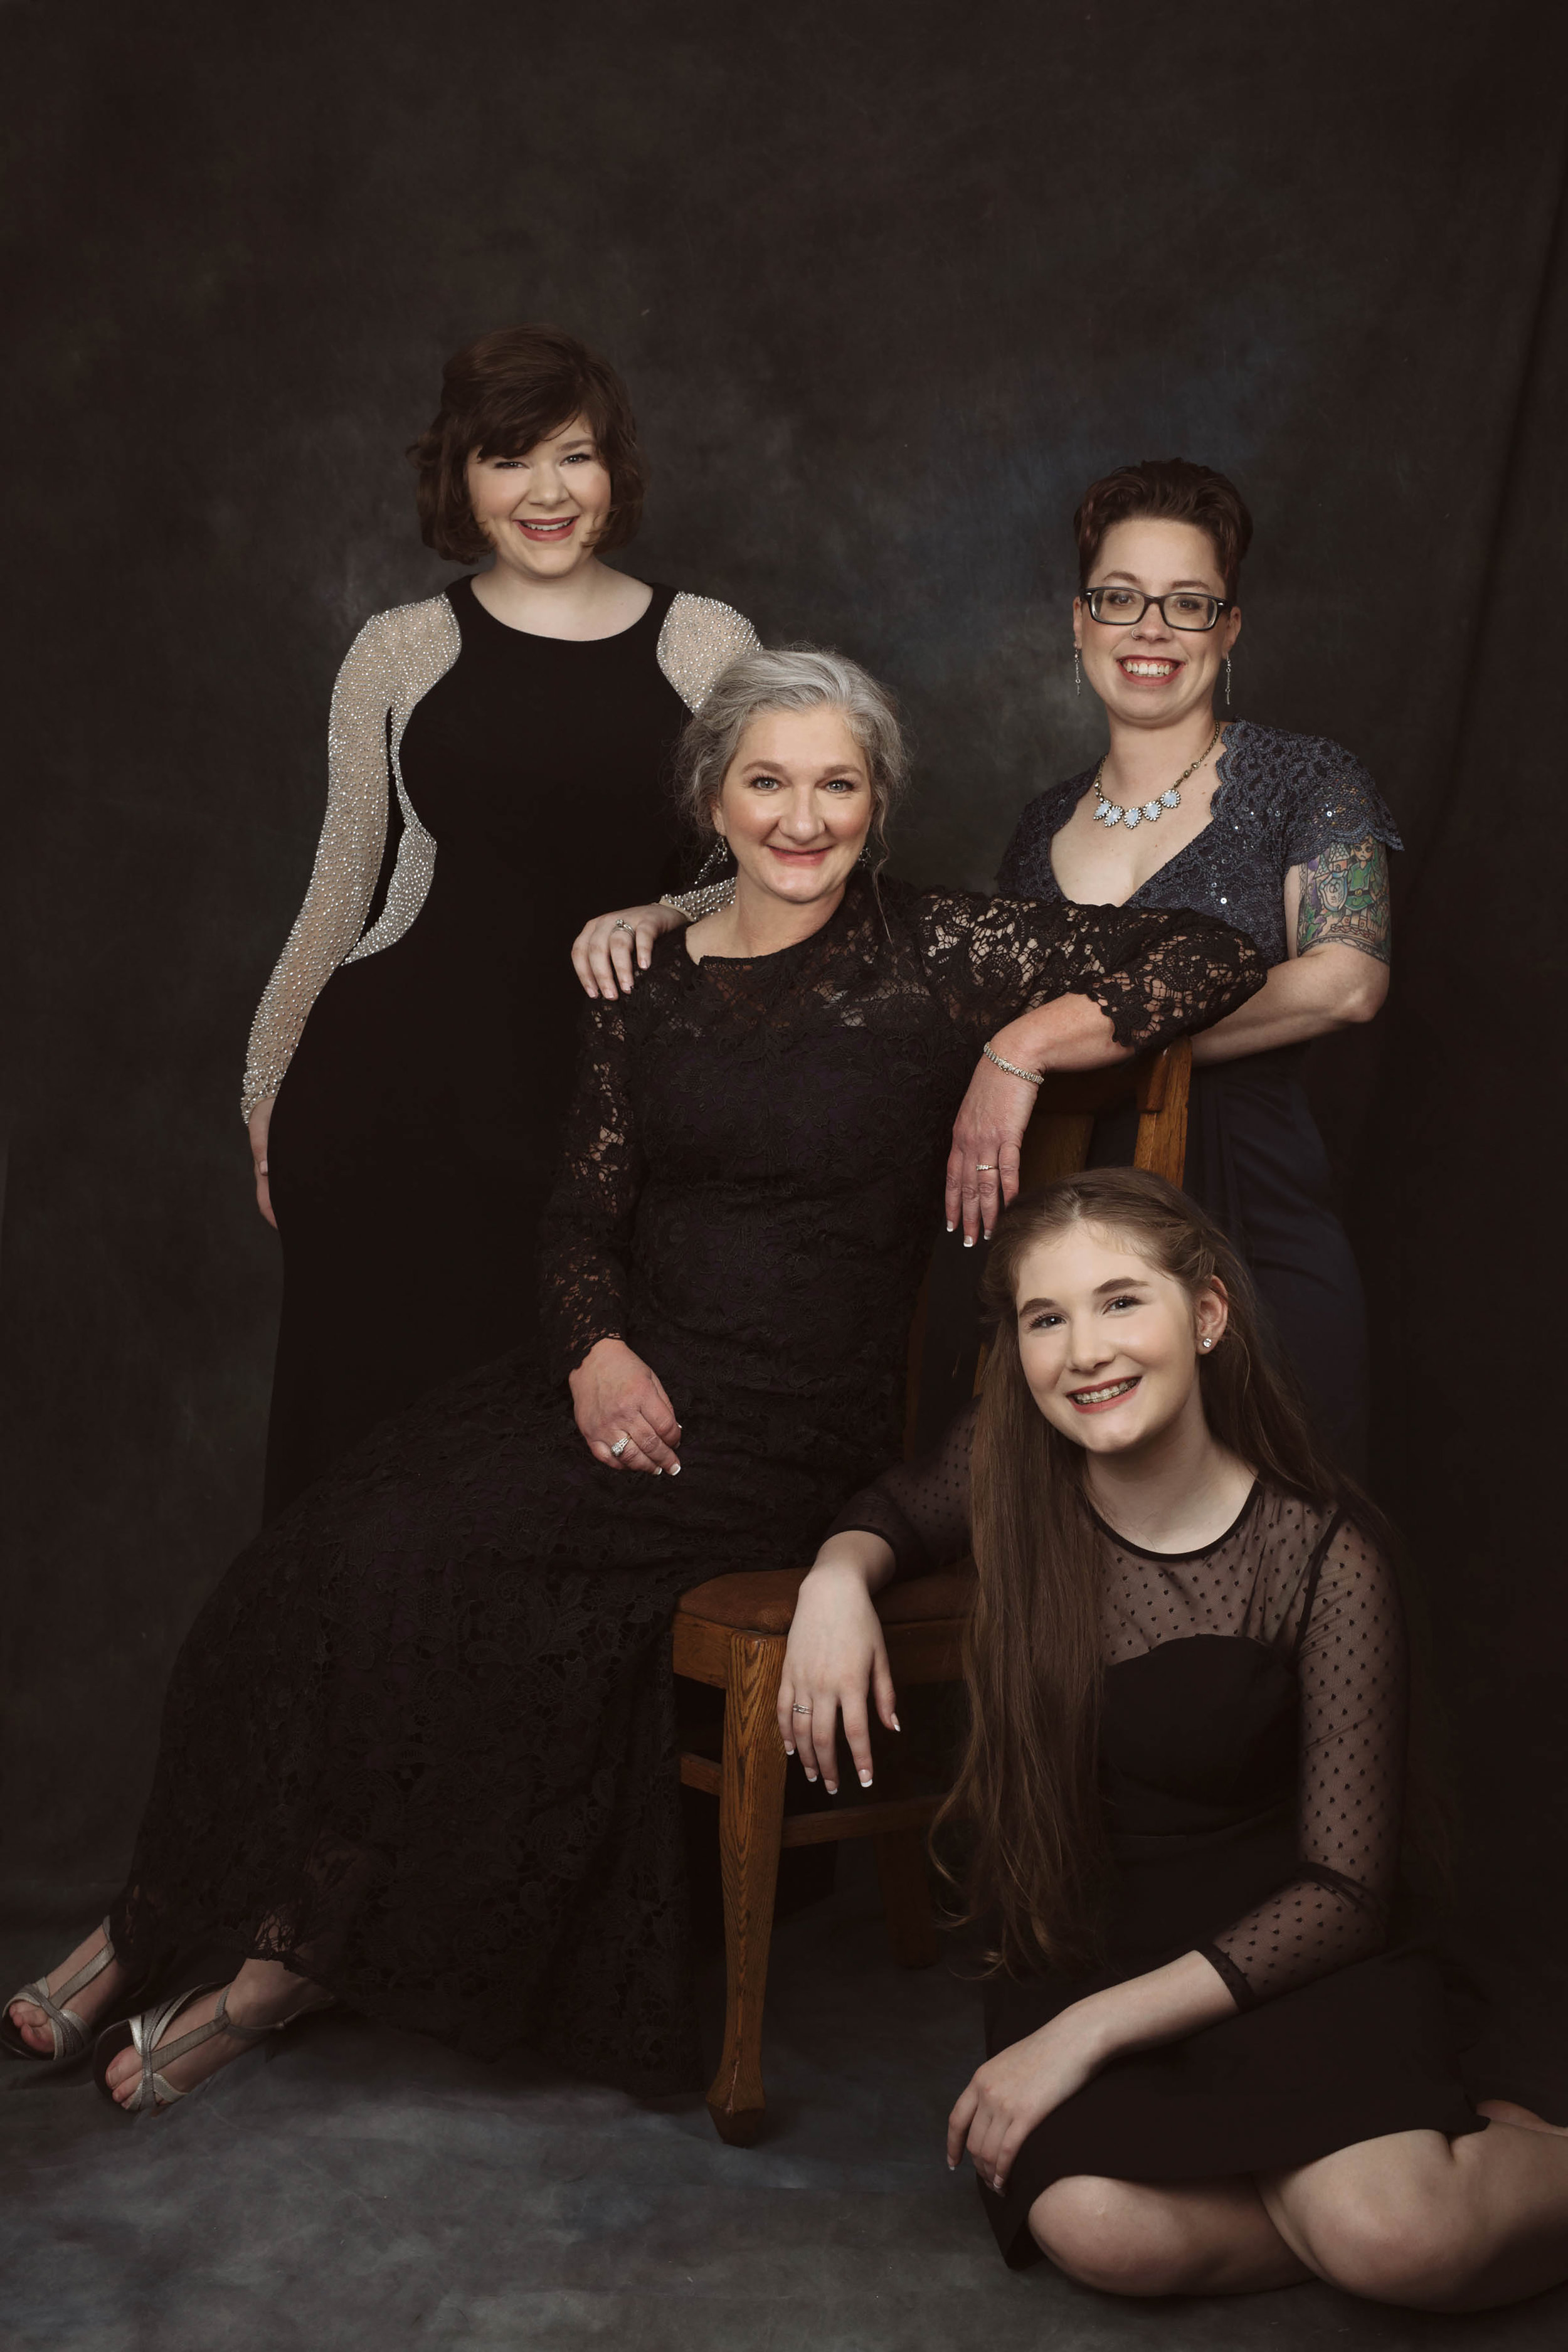 family portrait-legacy-asheville photographer